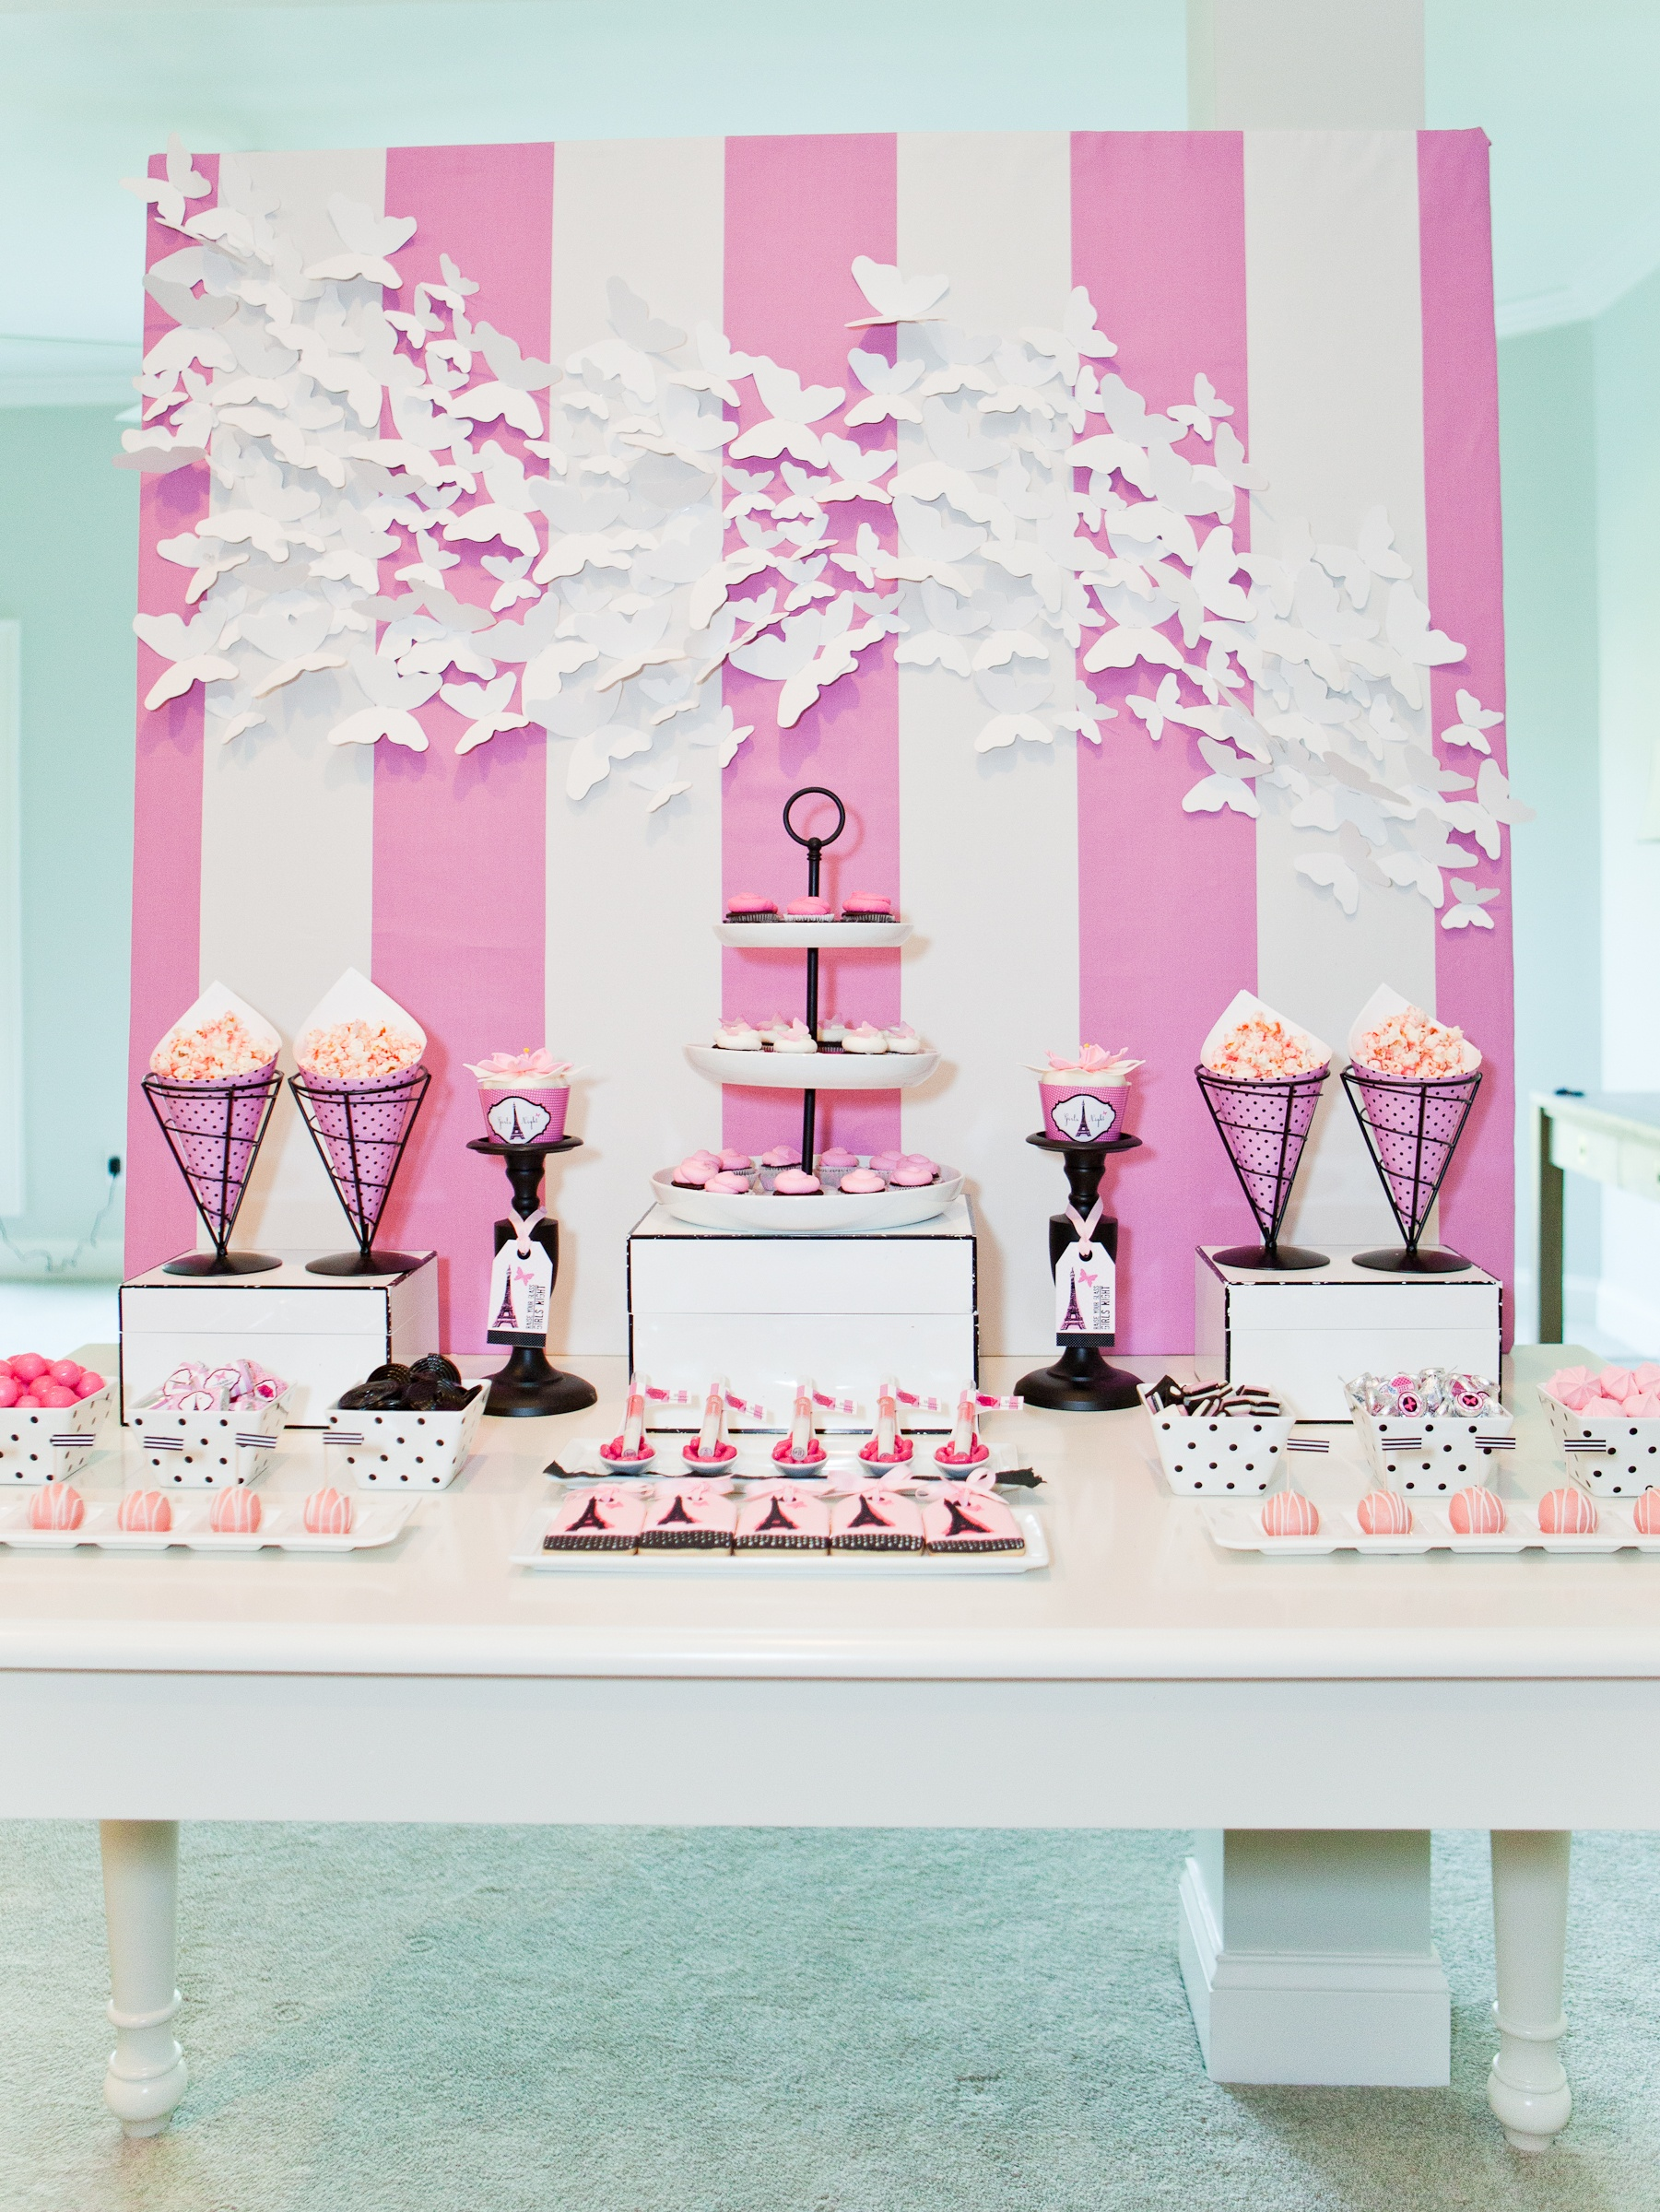 bridal shower party themes anders ruff custom designs llc. Black Bedroom Furniture Sets. Home Design Ideas